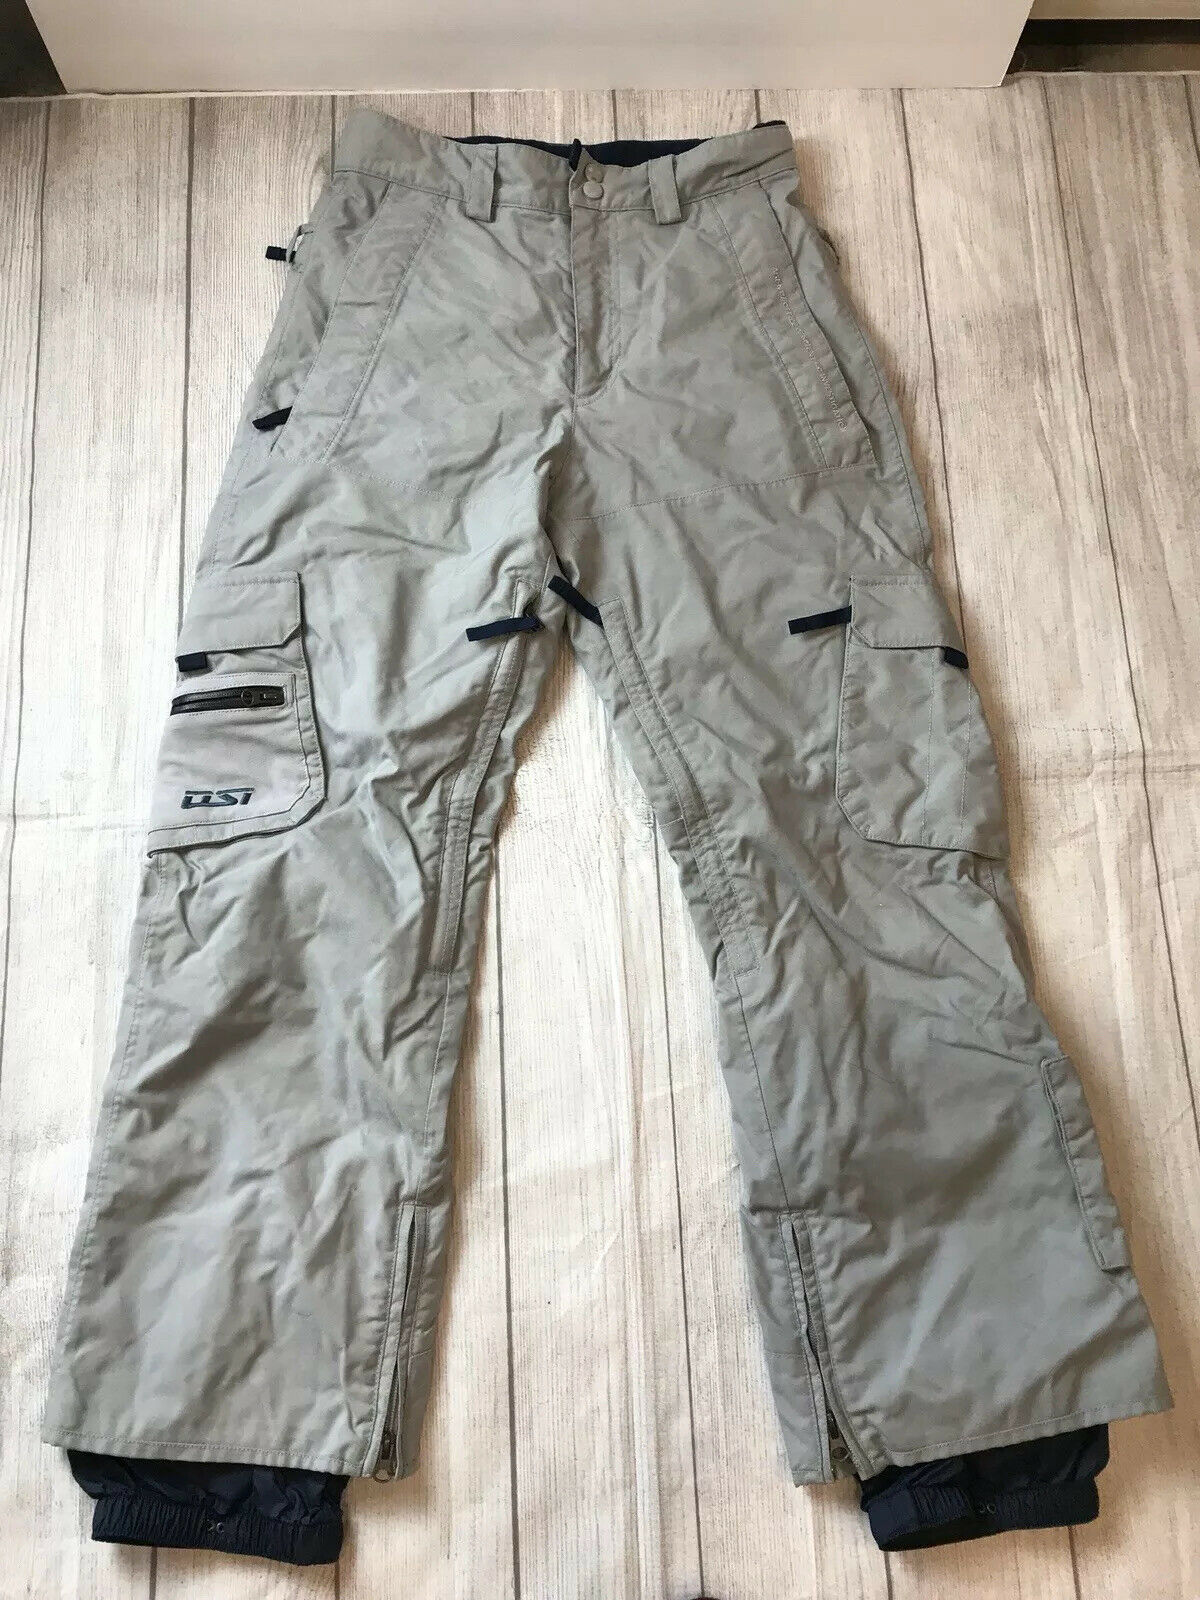 Extra sturdy BURTON OSI snow board pants vents taped seams mesh lined damen XS